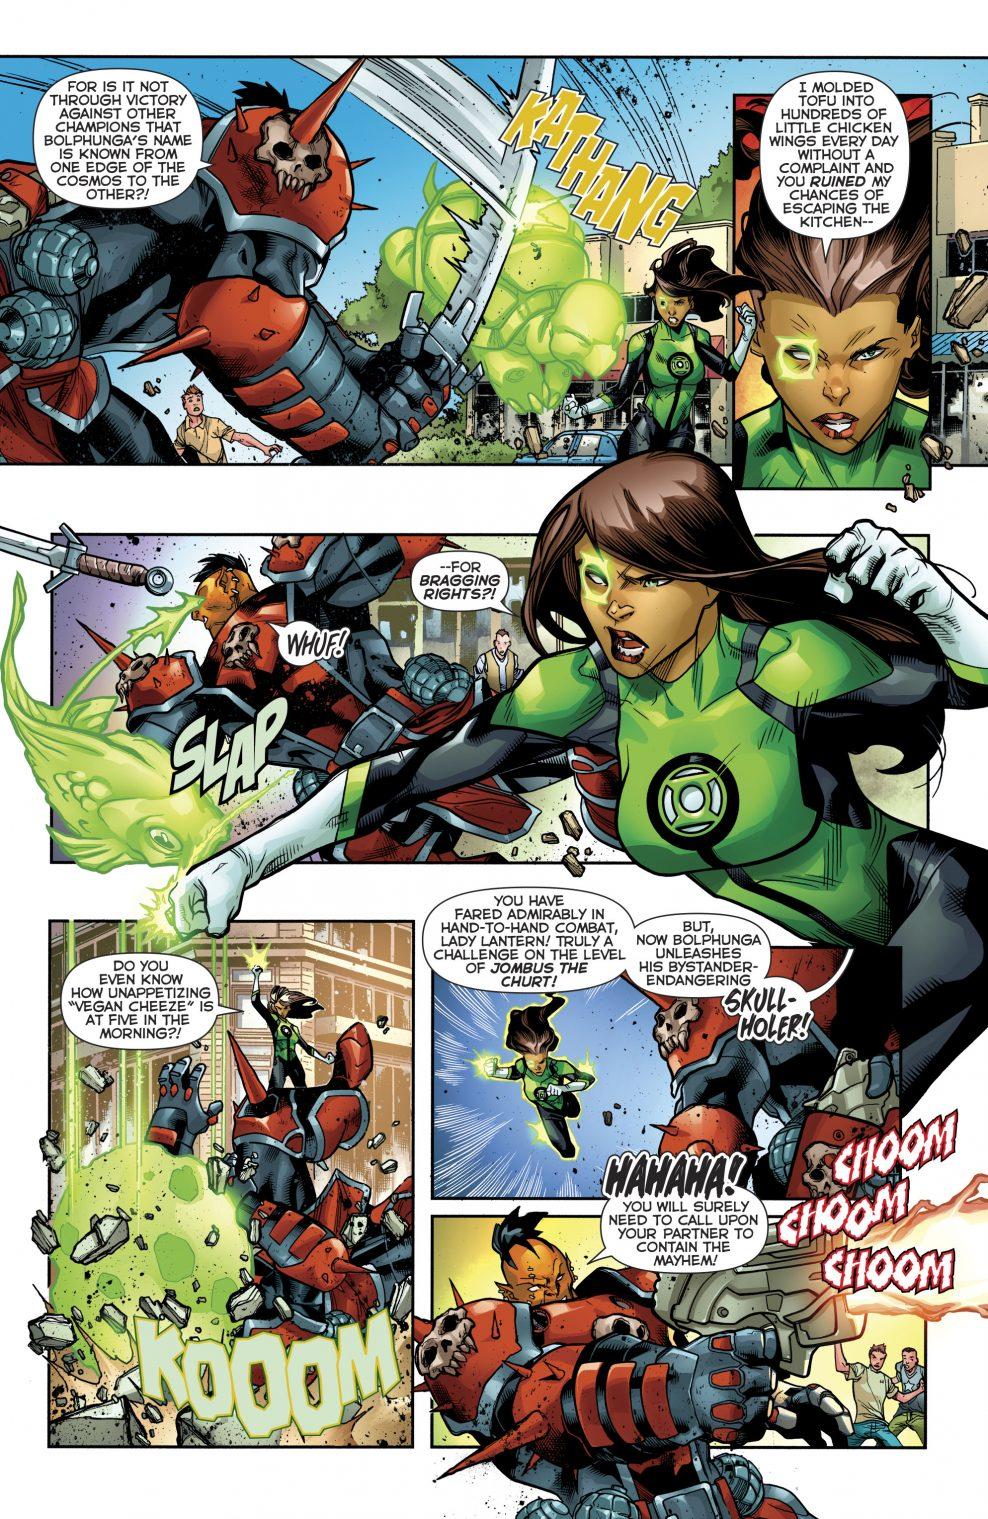 Green Lantern Jessica Cruz VS Bolphunga